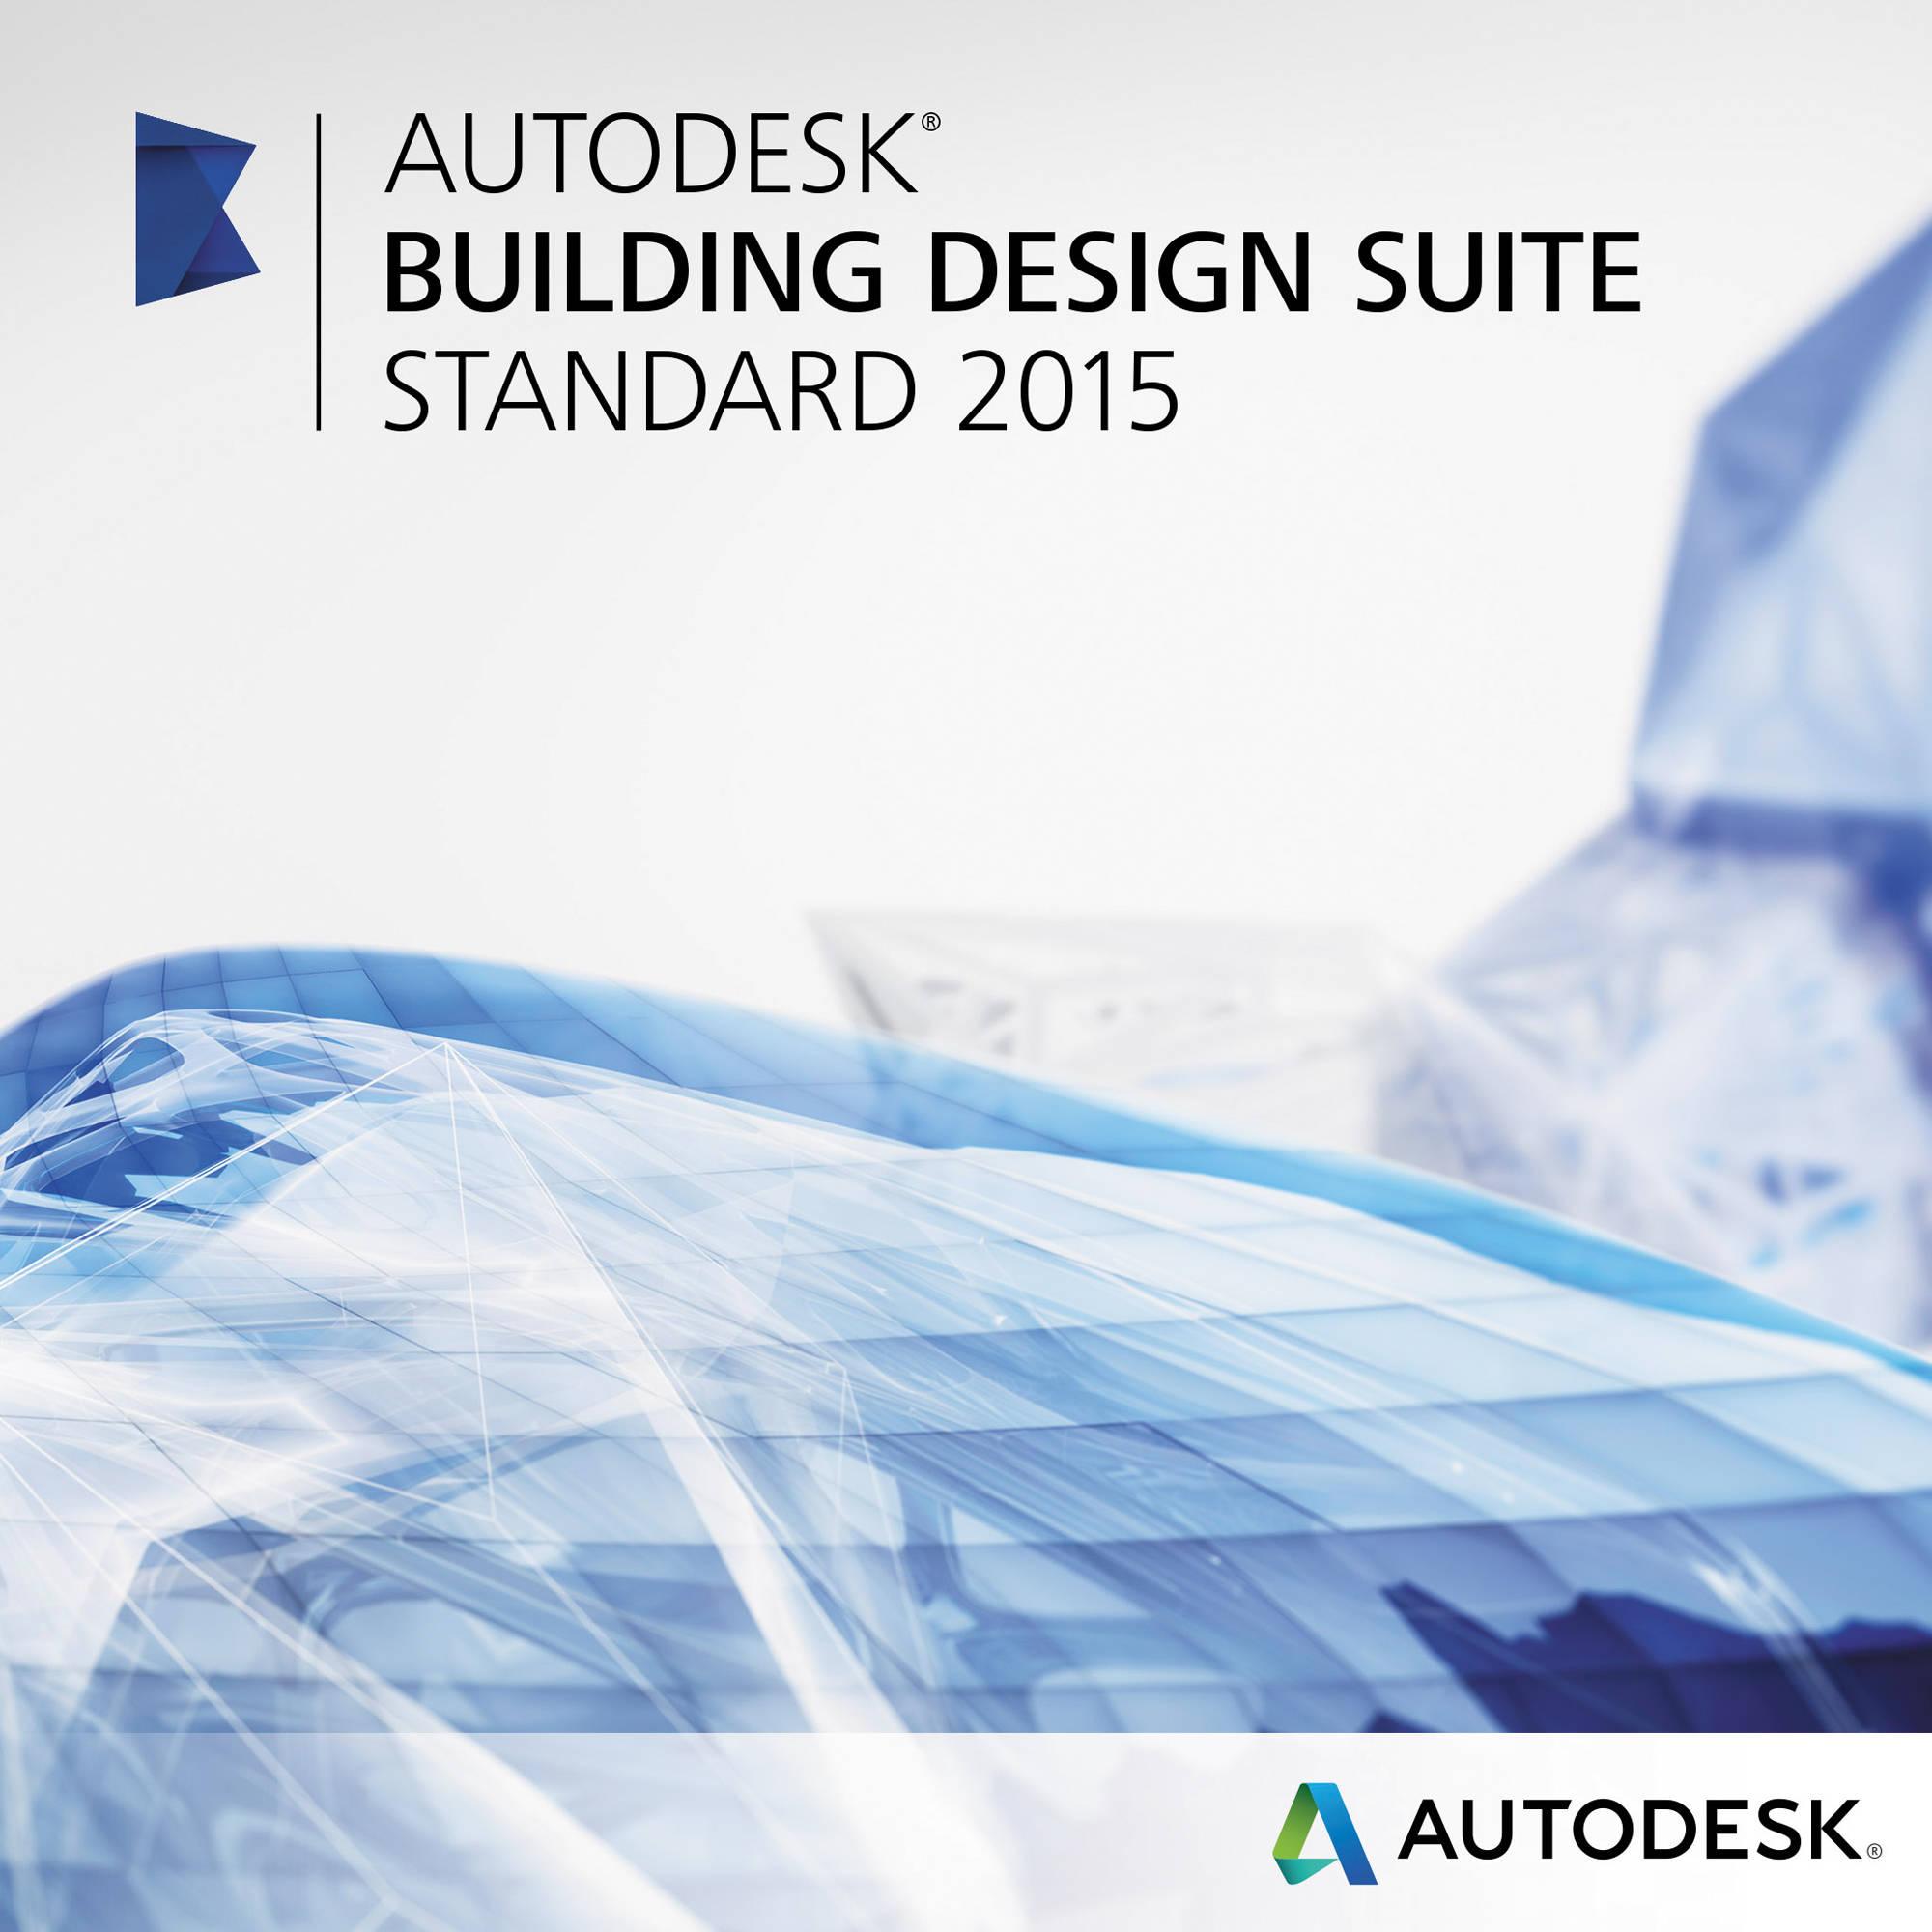 Autodesk Building Design Suite Standard 2015 784G1-WWR111-1001